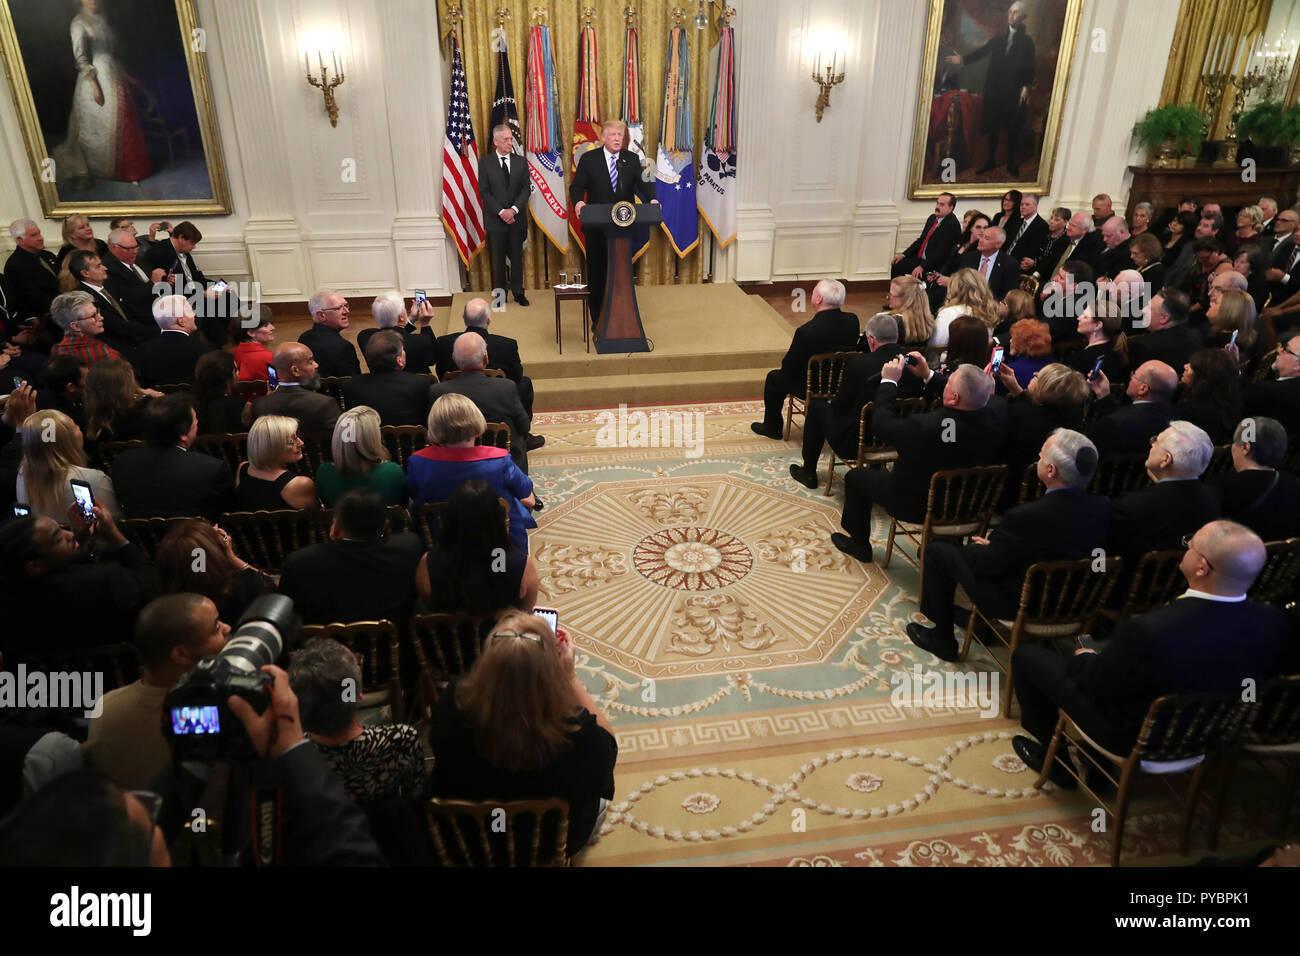 Washington DC, USA  26th Oct, 2018  United States President Donald J